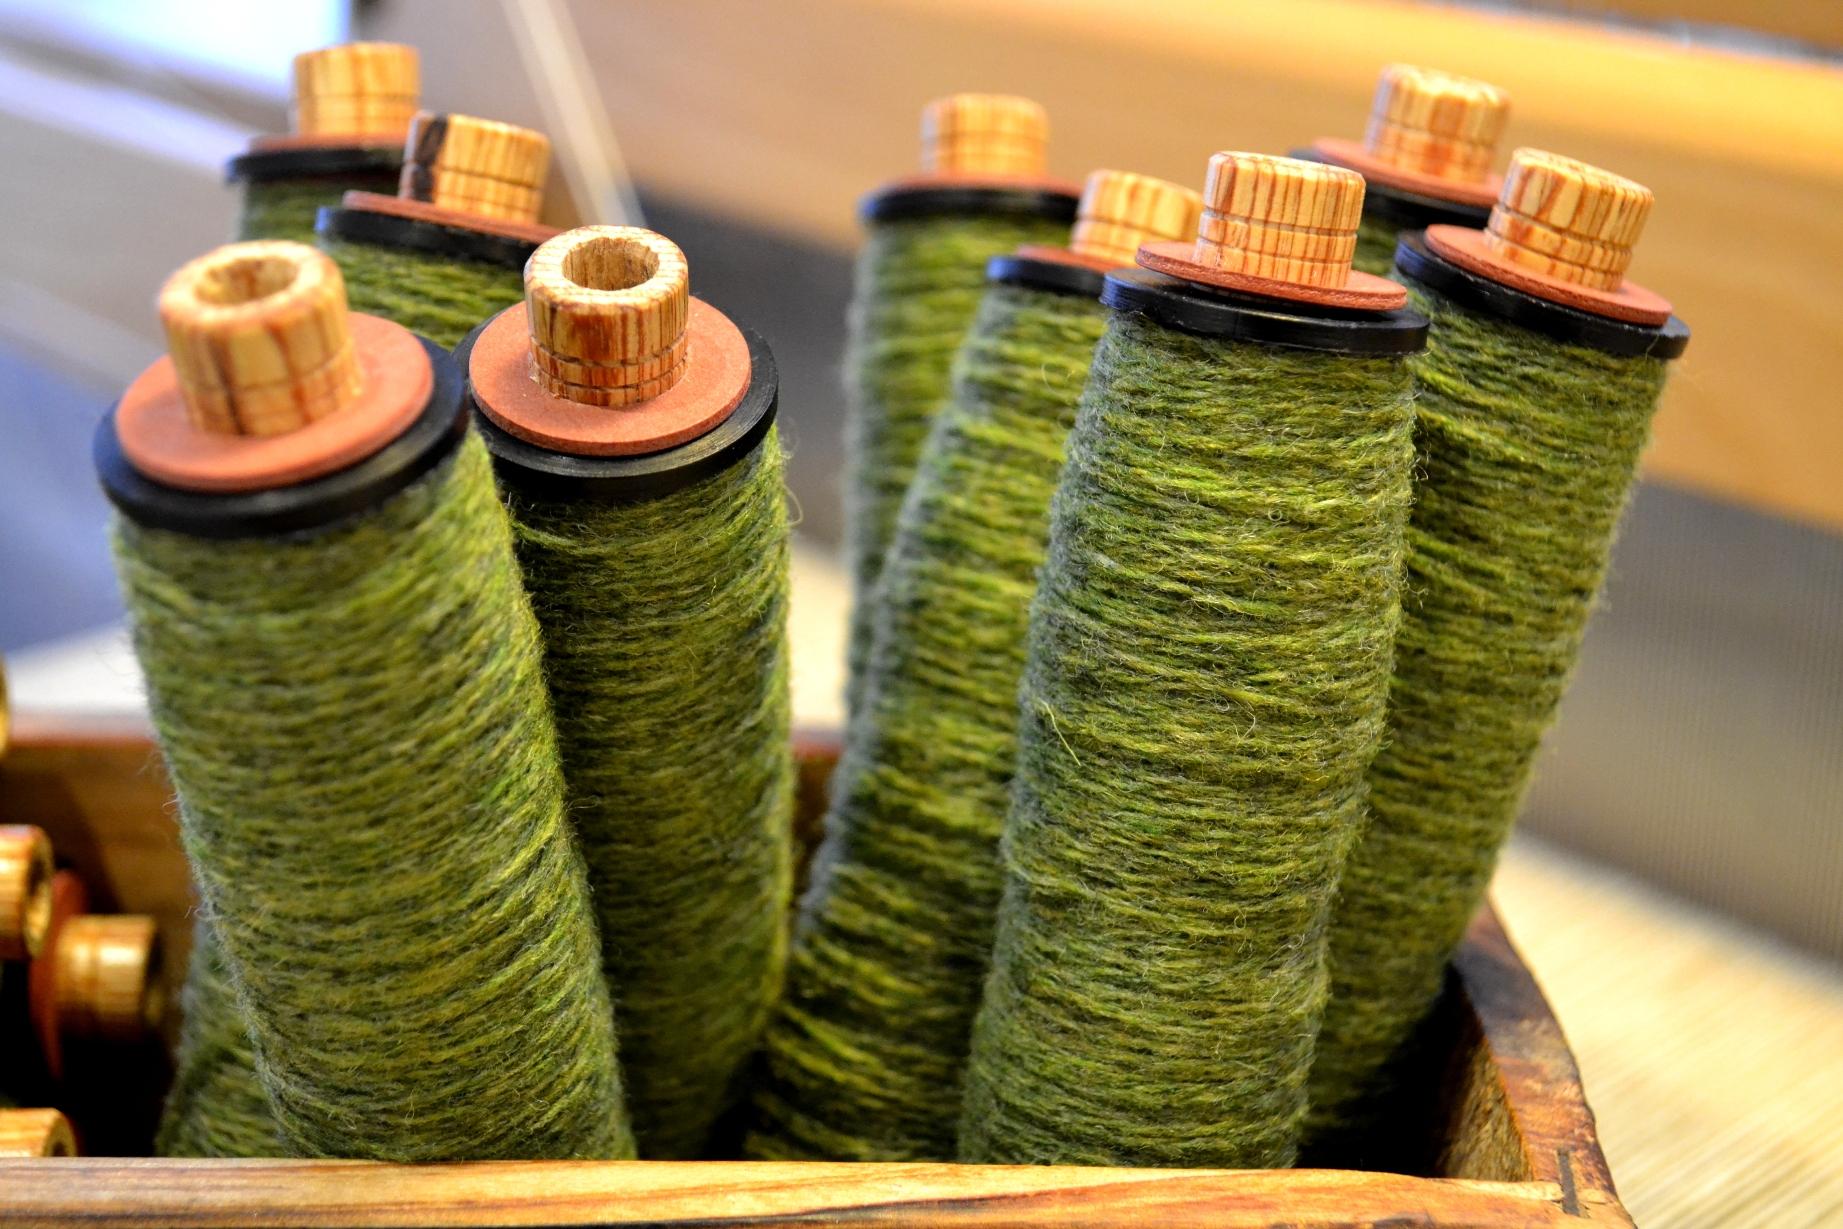 Green yarn on pirns ready for weaving